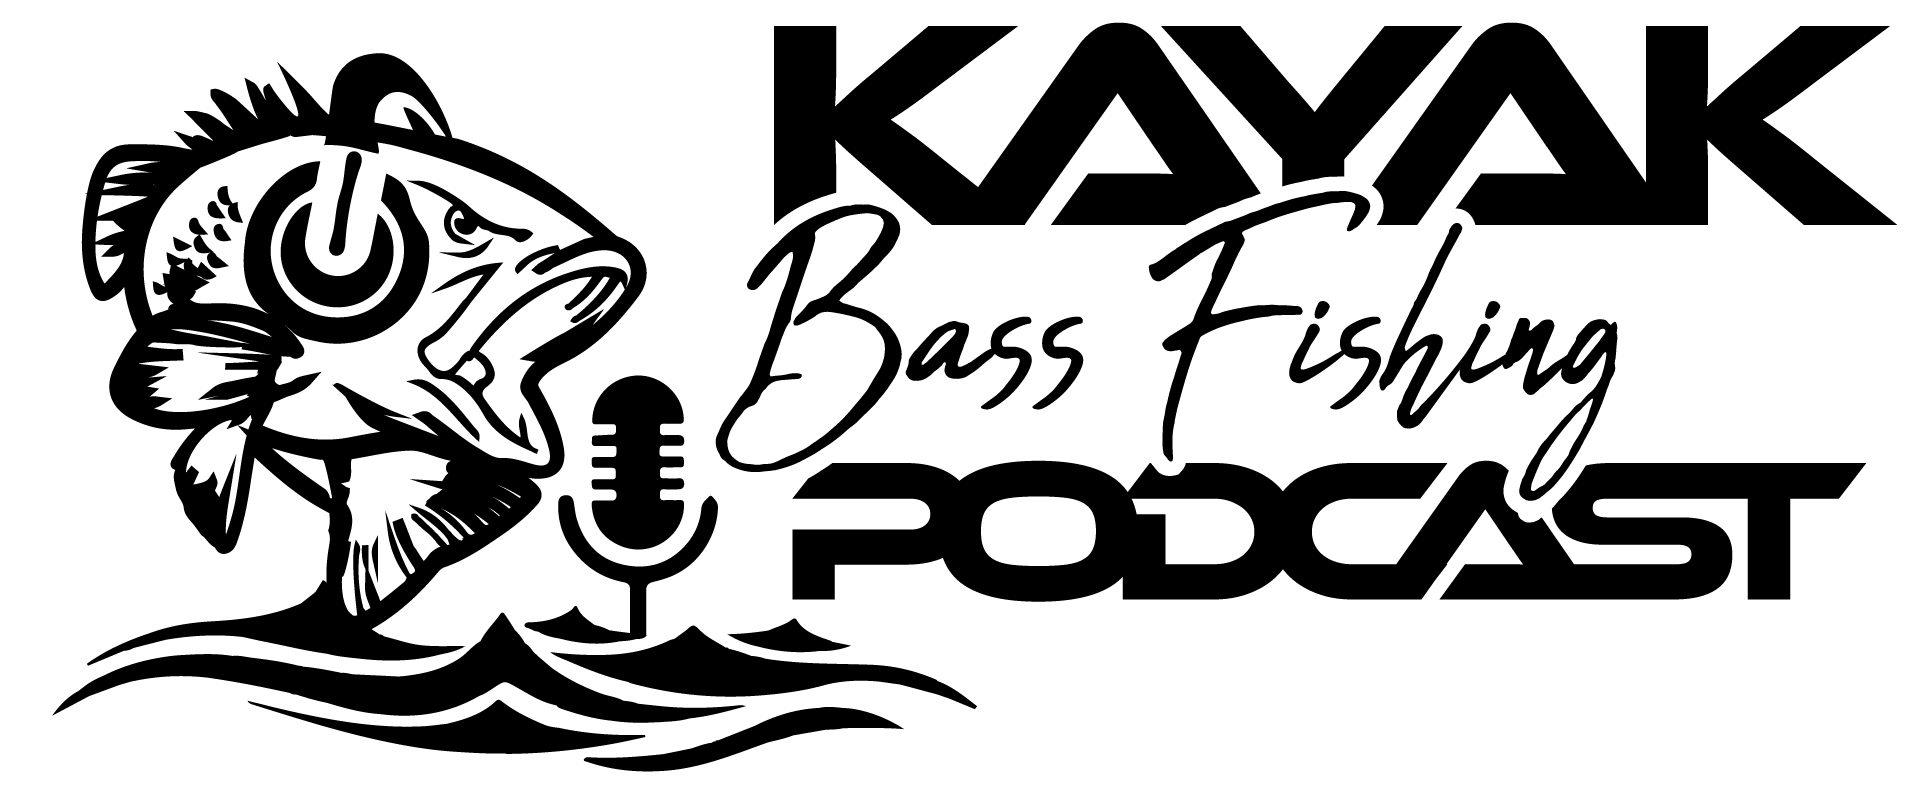 The Kayak Bass Fishing Podcast